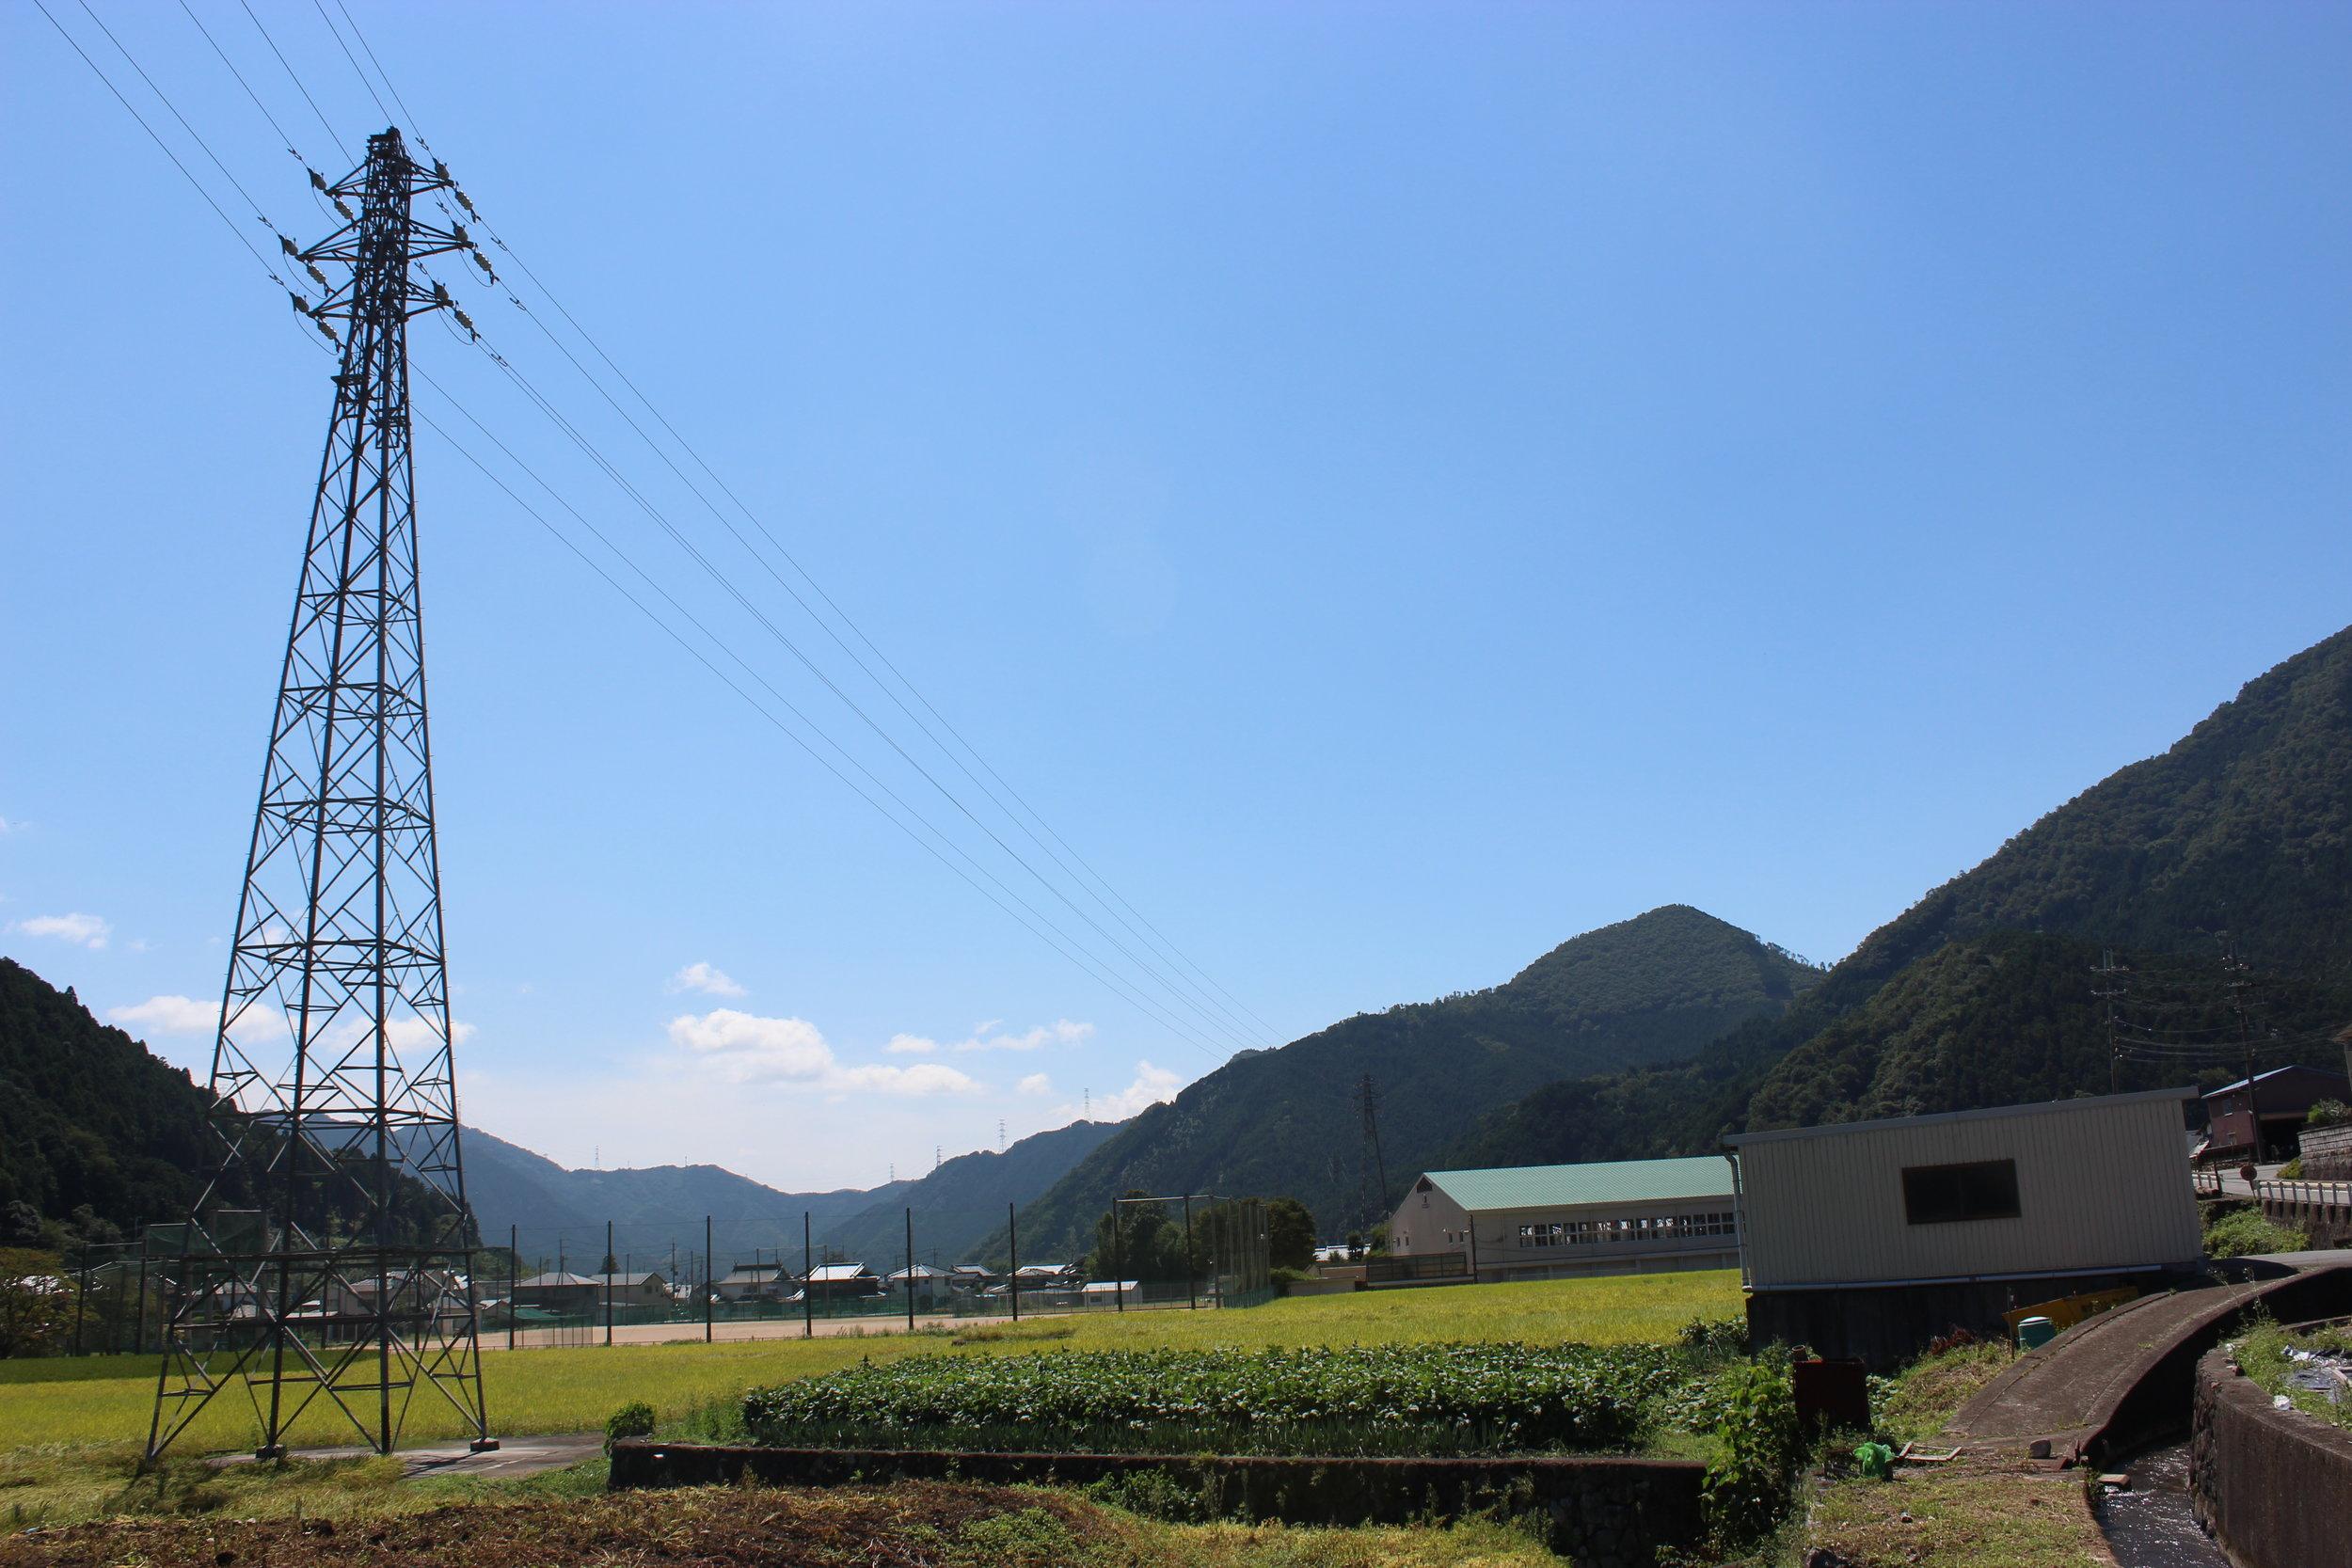 IMG_0396.JPG